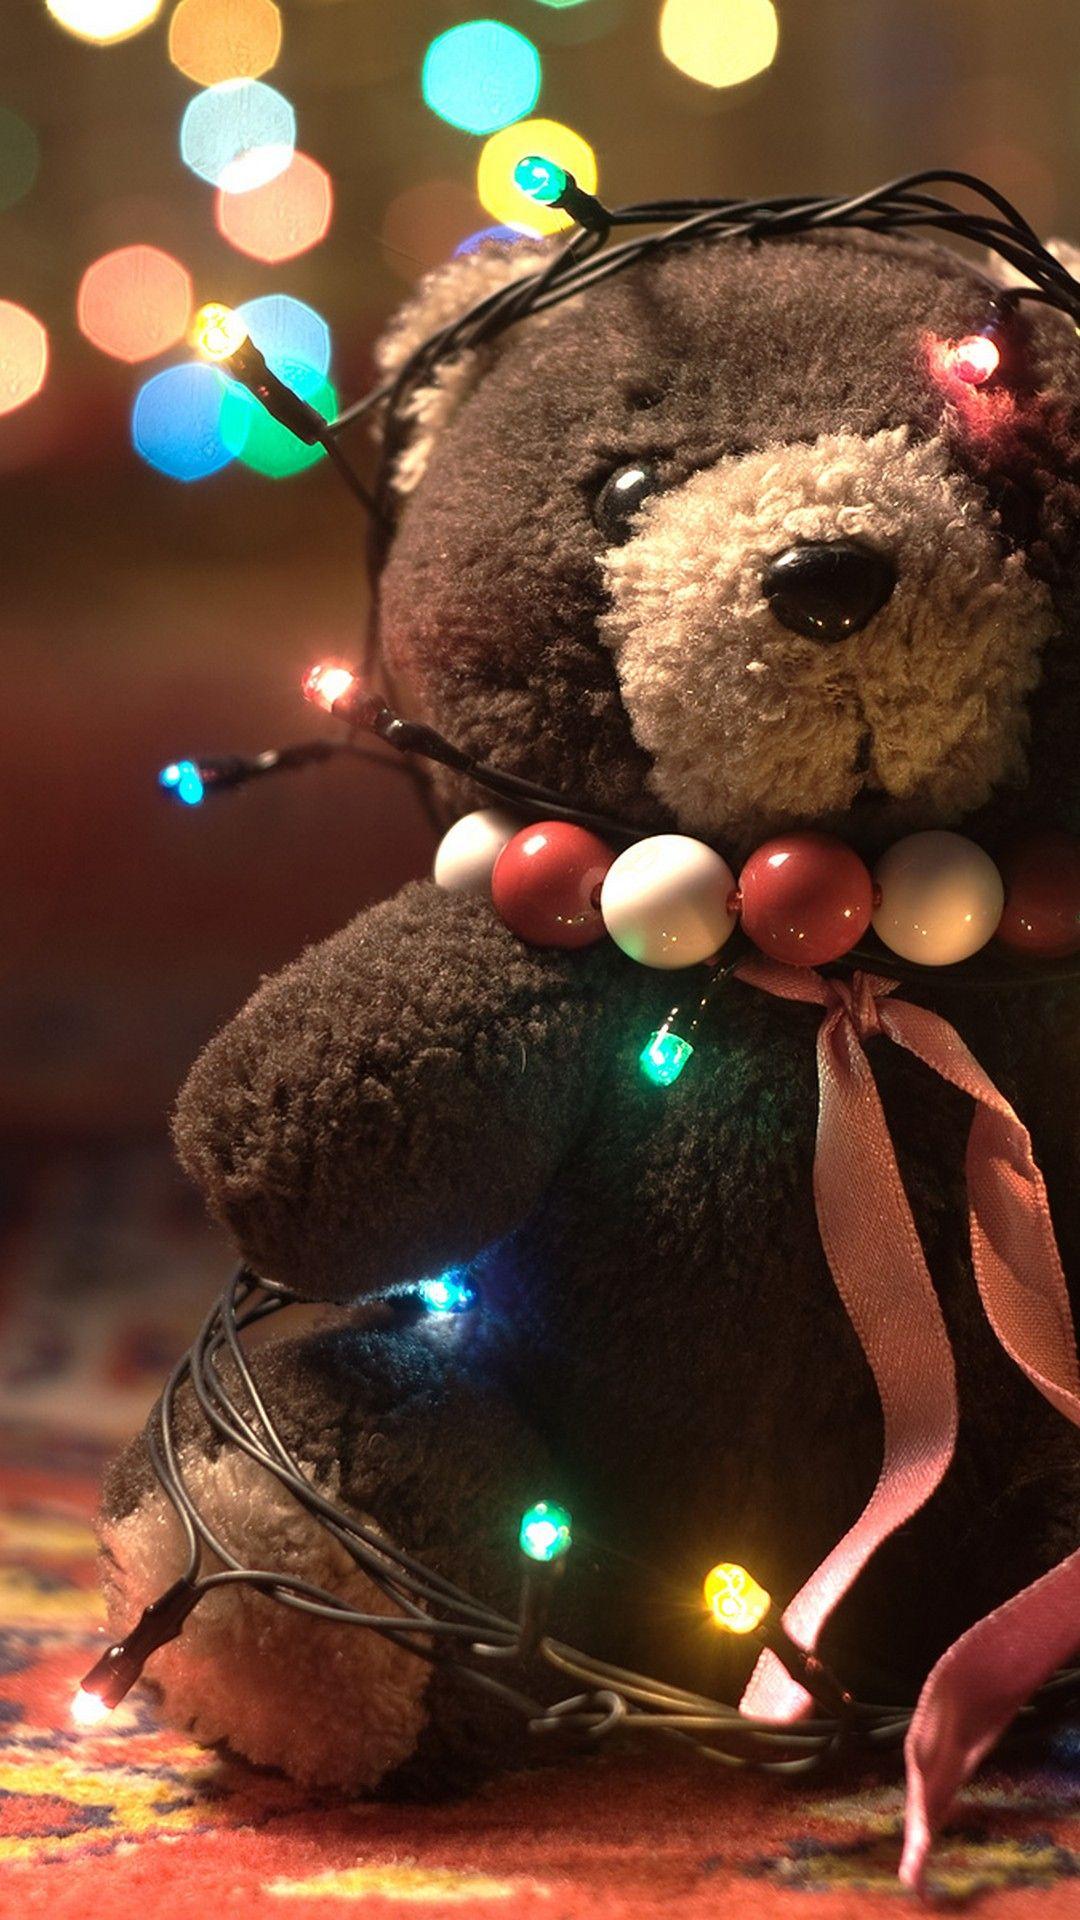 Cute Teddy Bear Wallpaper For Iphone